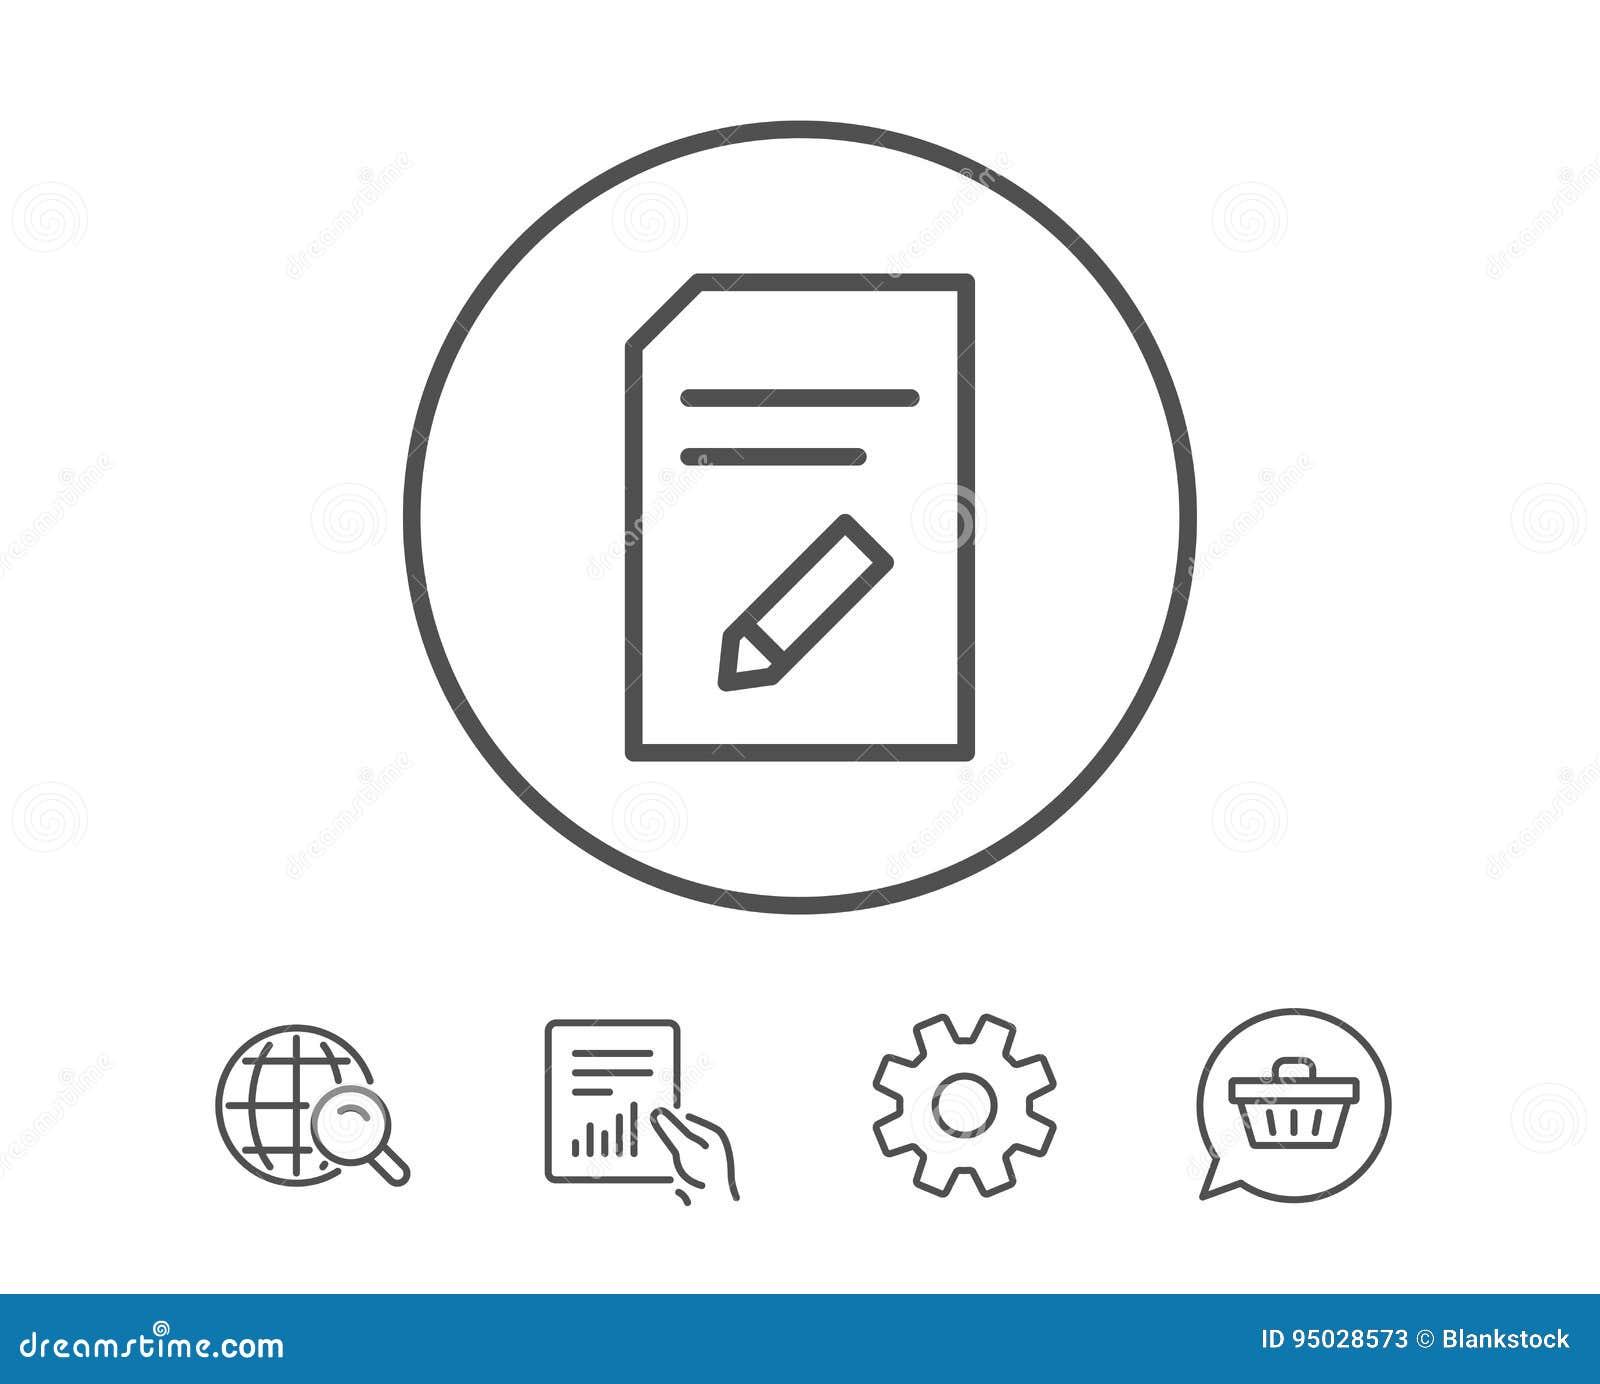 Redigera dokumentlinjen symbol Mapptecken